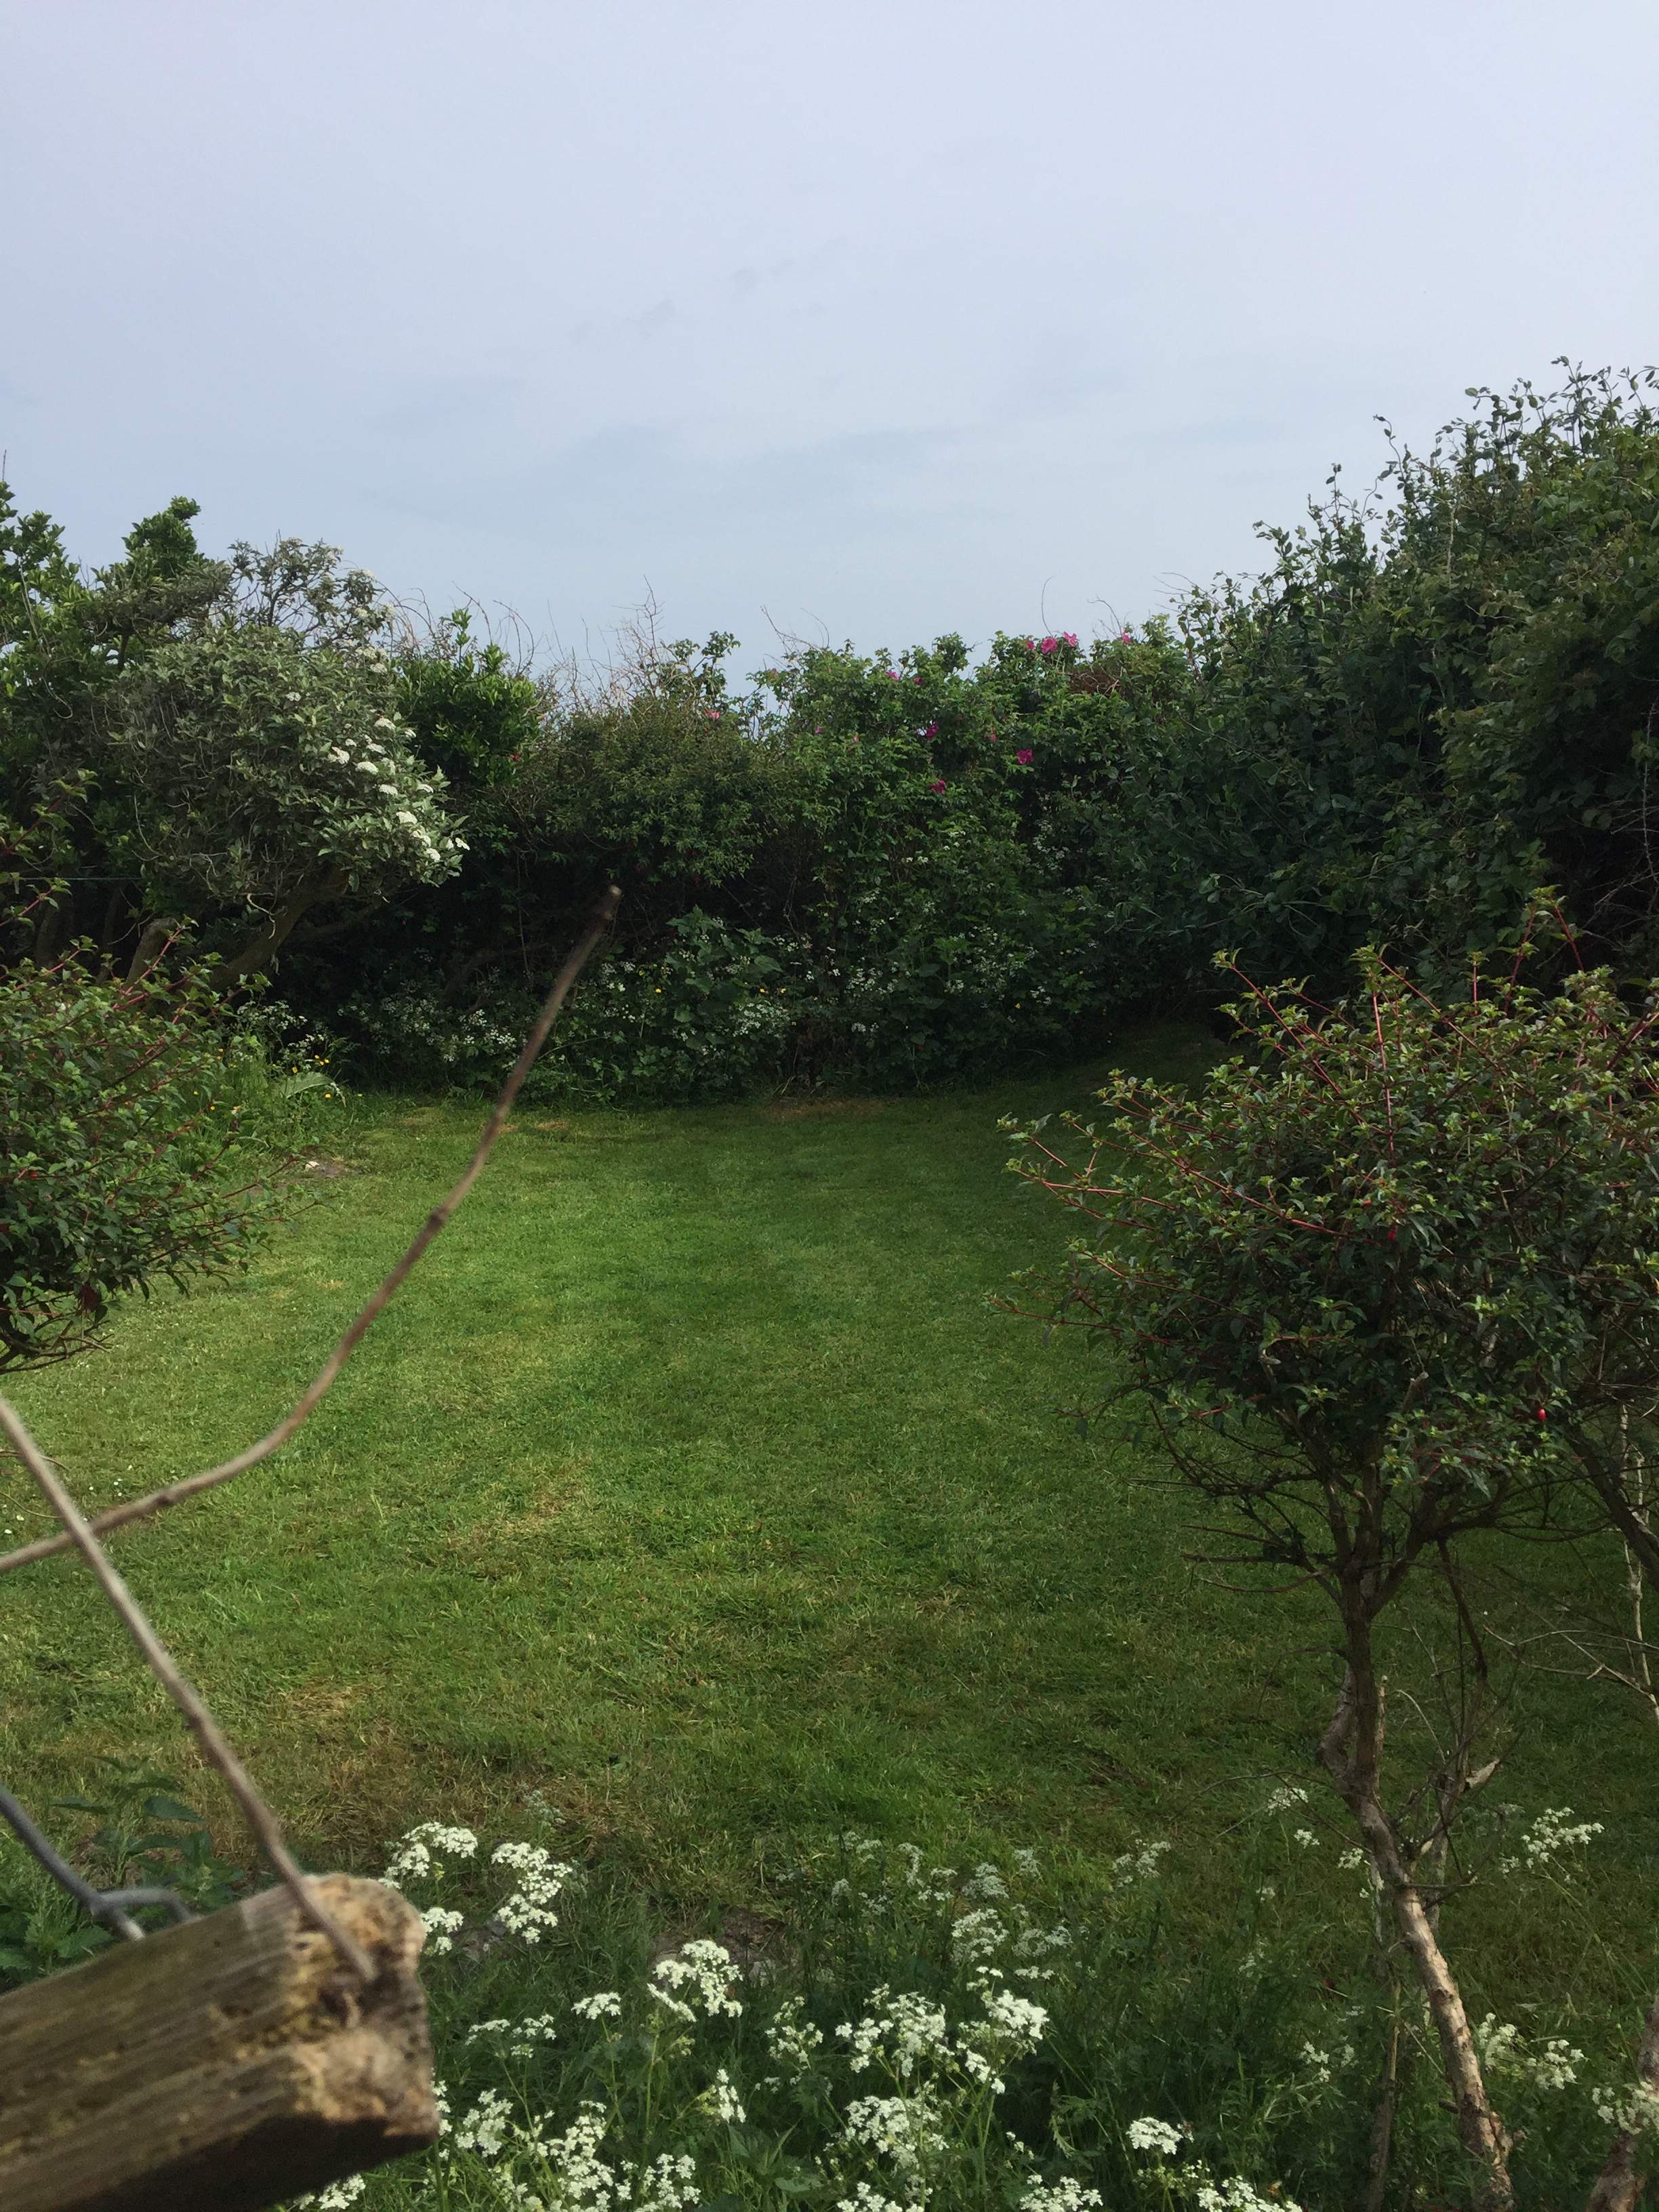 Gardd cefn | Back garden